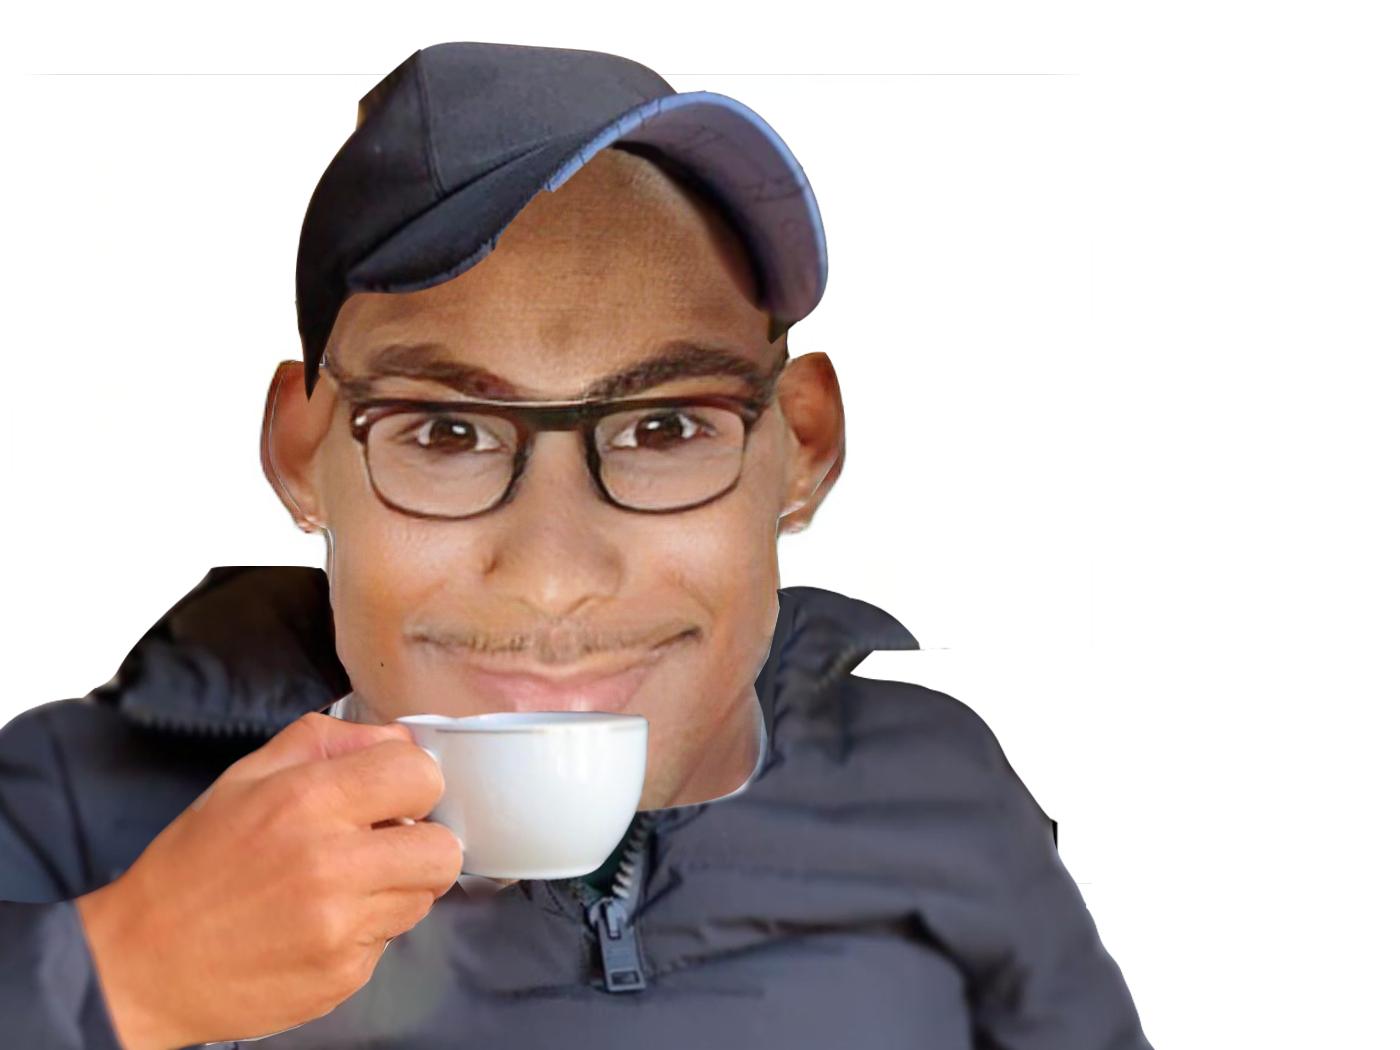 Sticker zizou zinedine zidane ronaldo faceapp cr7 chauve casquette doudoune cristiano tasse sourire rire